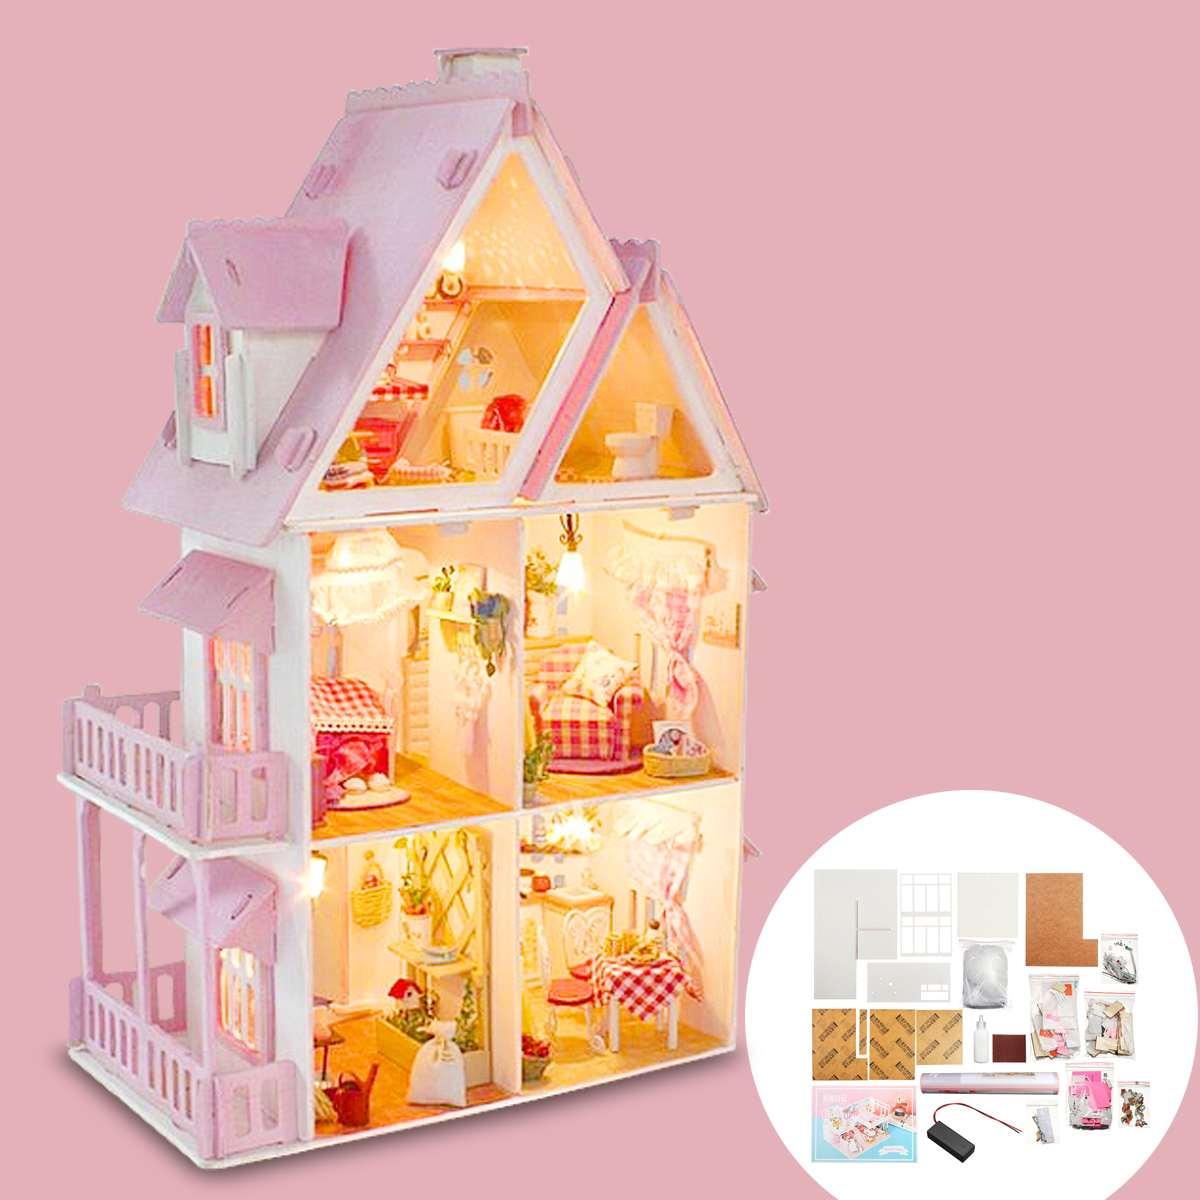 DIY Wooden Dolls House Miniature Box Handmade LED Light Miniature Dollhouse Furniture Doll House Accessories For Children Gift